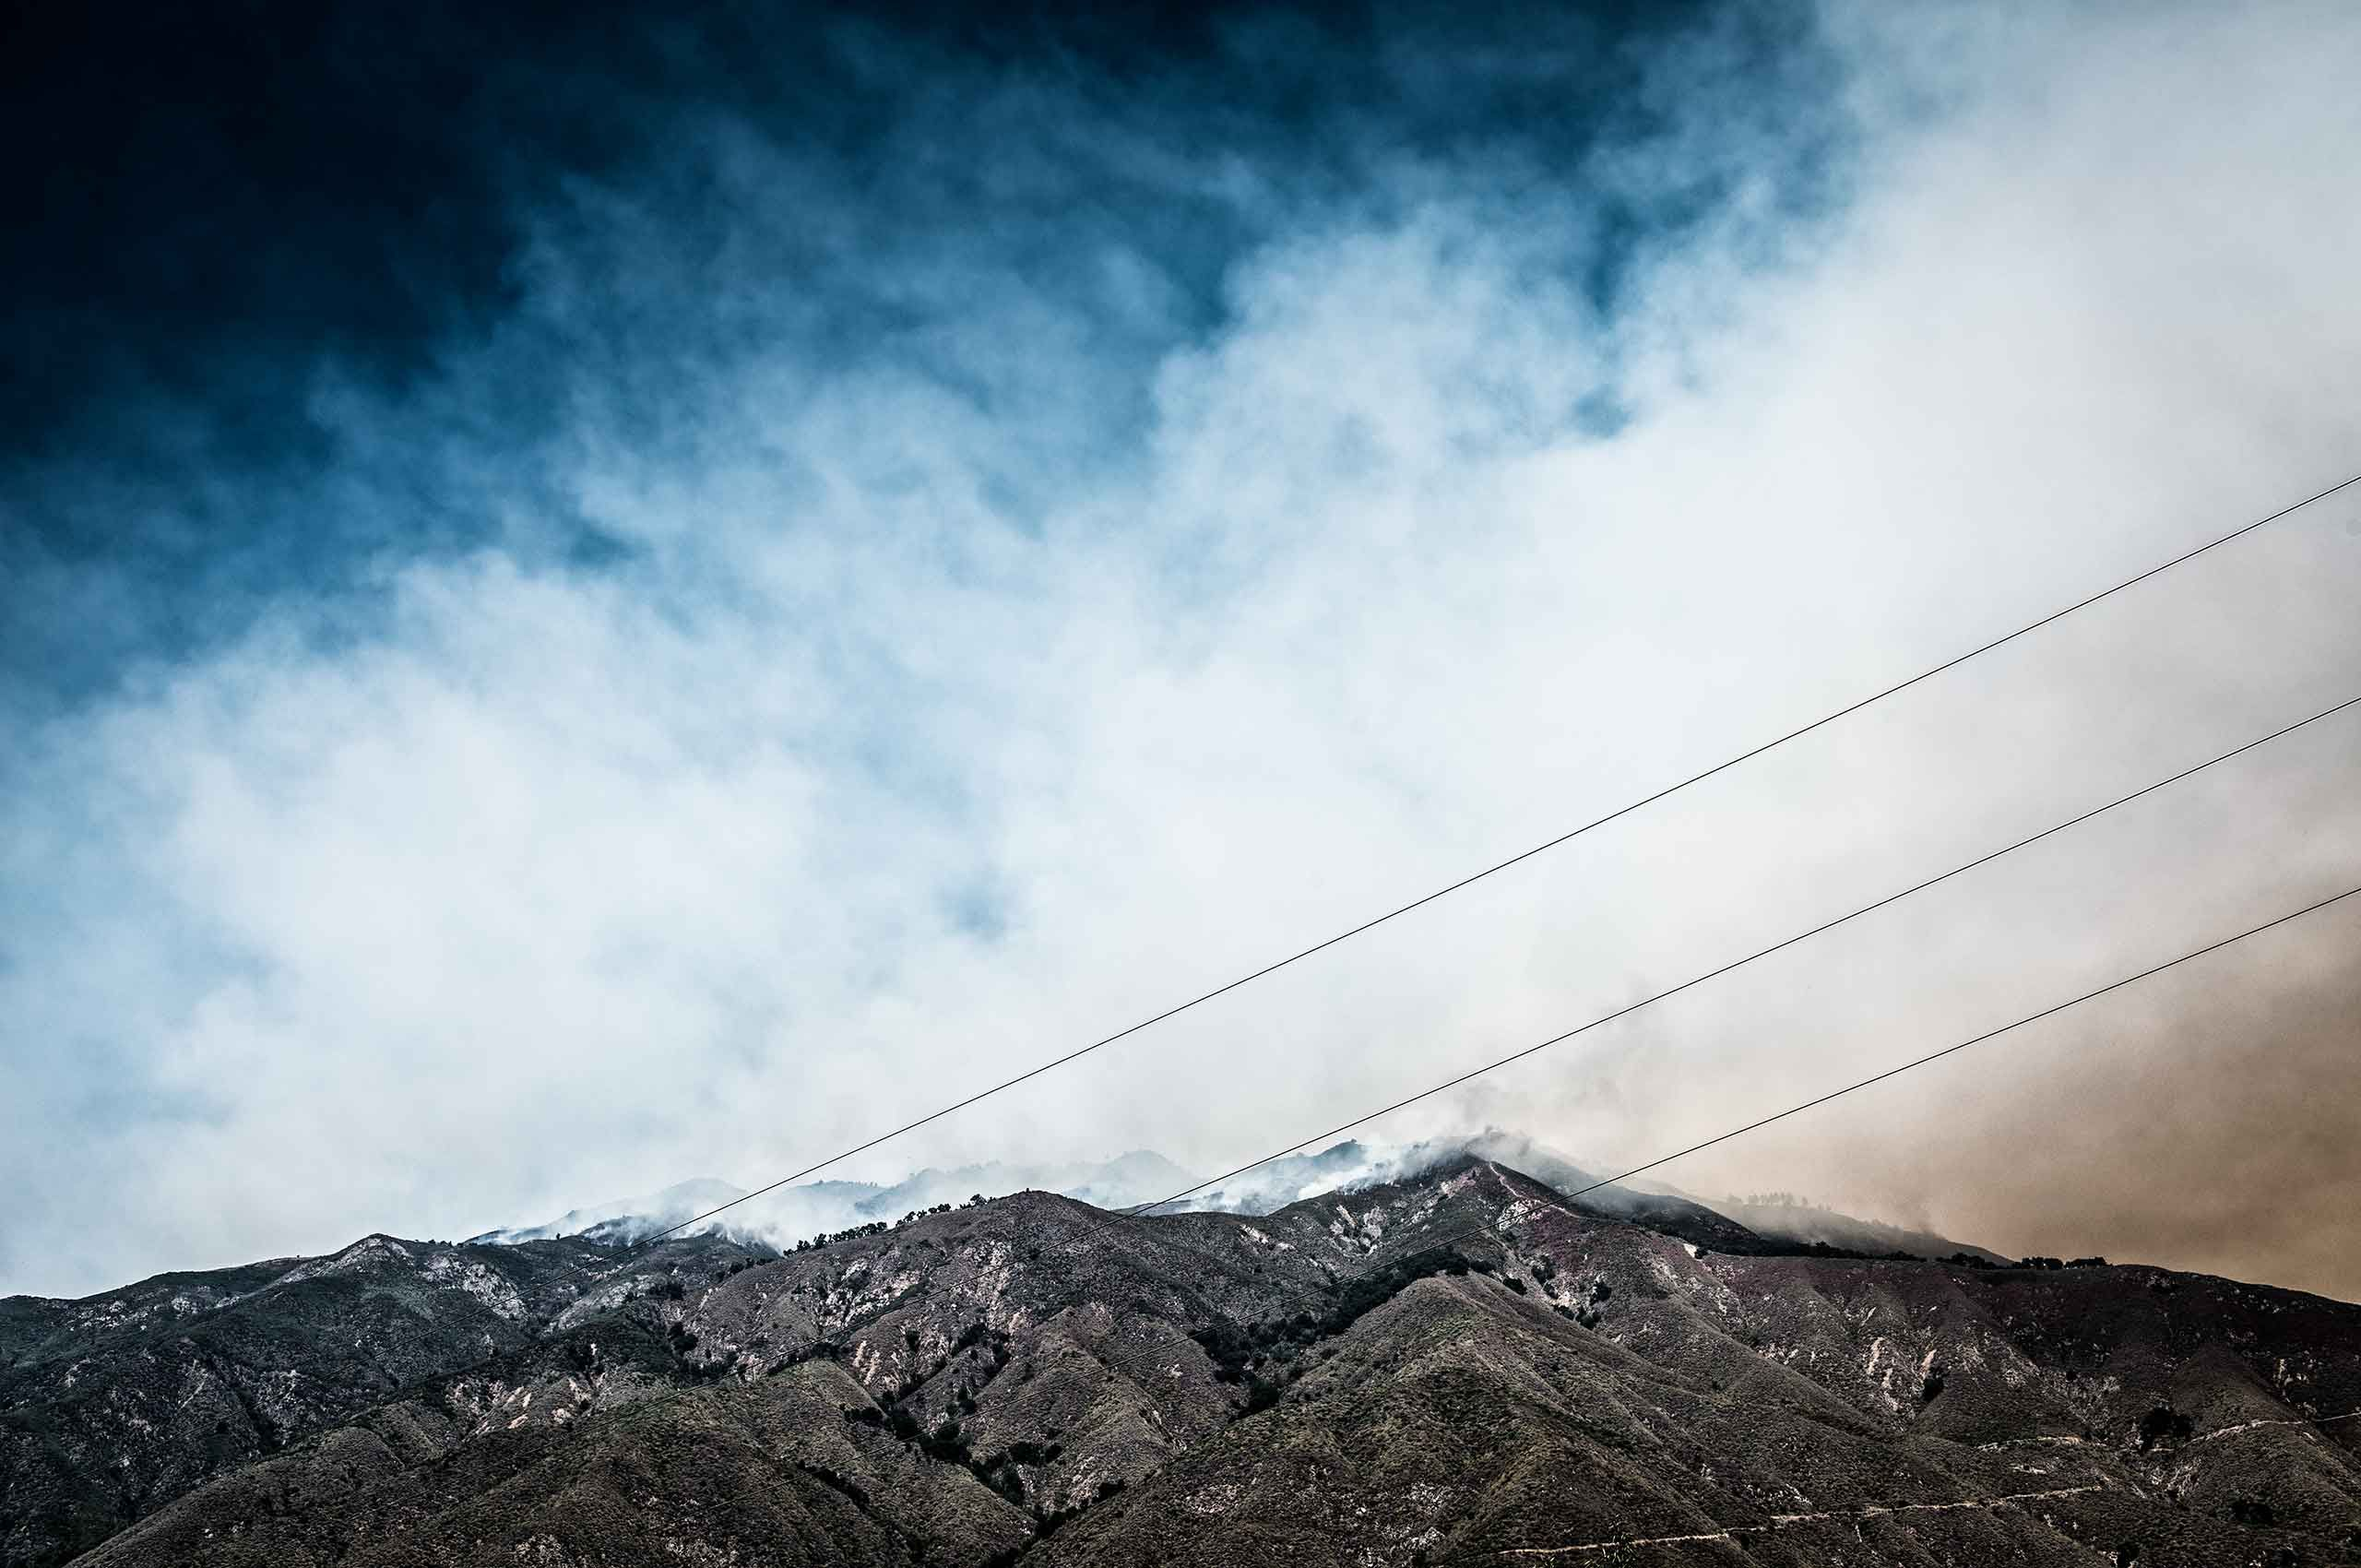 californiawildfire-bigsur-by-HenrikOlundPhotography.jpg